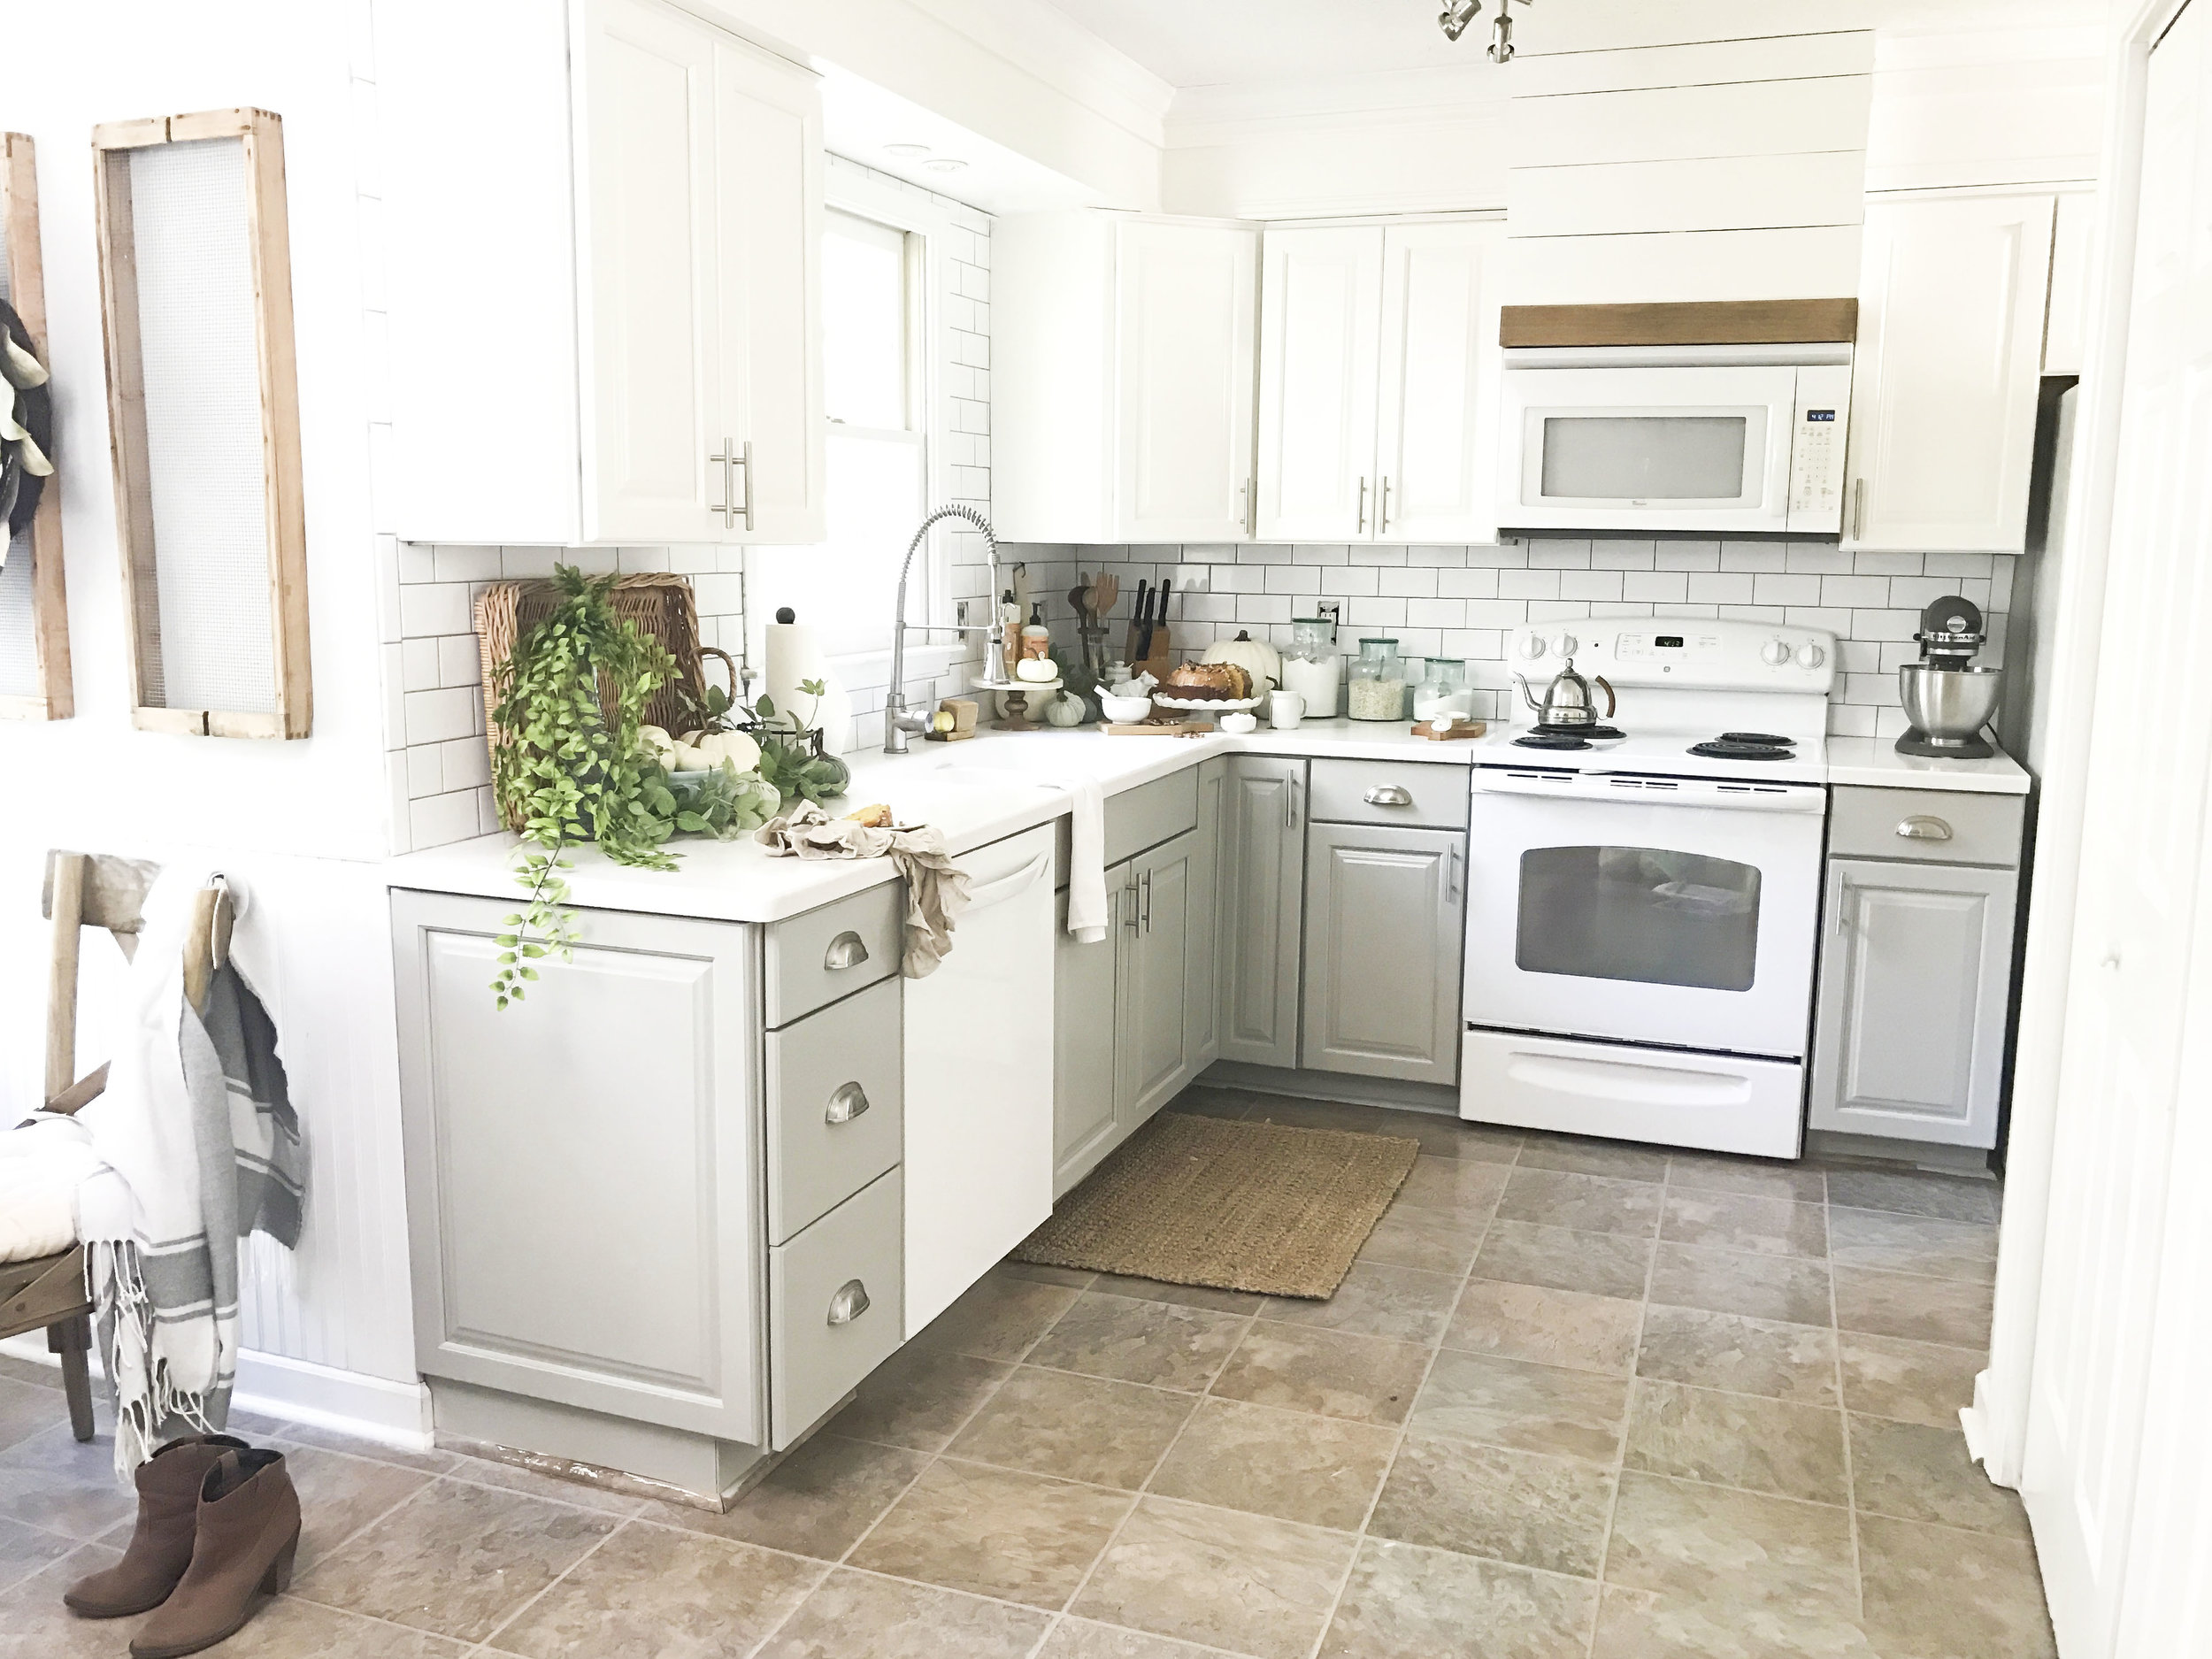 Plum Pretty Decor Design Co Painted Kitchen Cabinets Budget